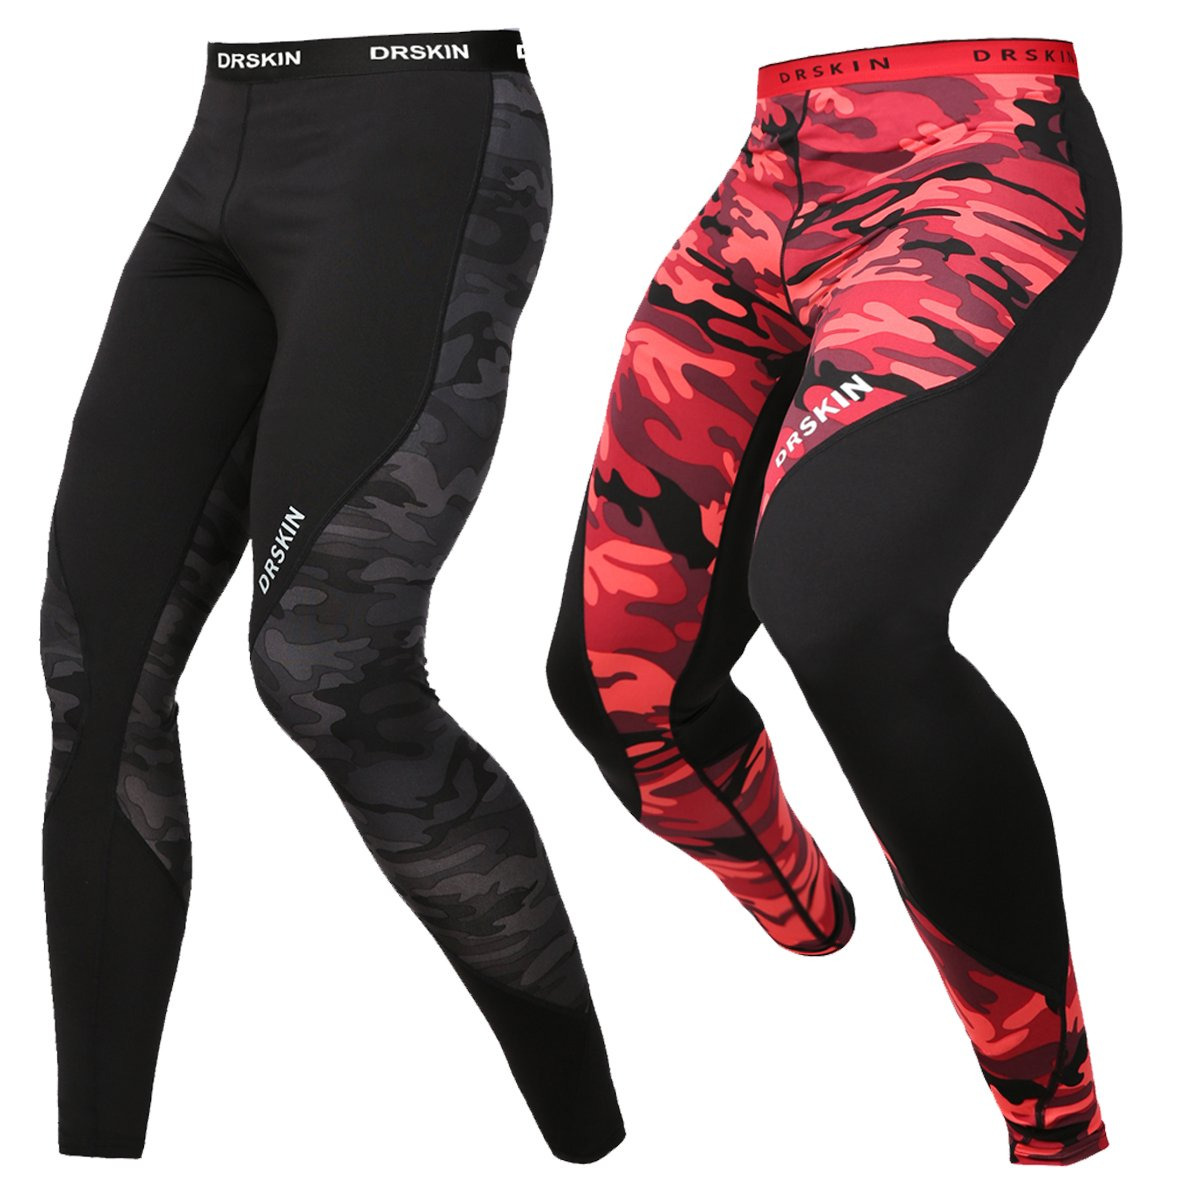 DRSKIN Men's Compression Dry Cool Sports Tights Pants Baselayer Running Leggings Yoga (Twin (MRE-B03+B-MBB04), XL)